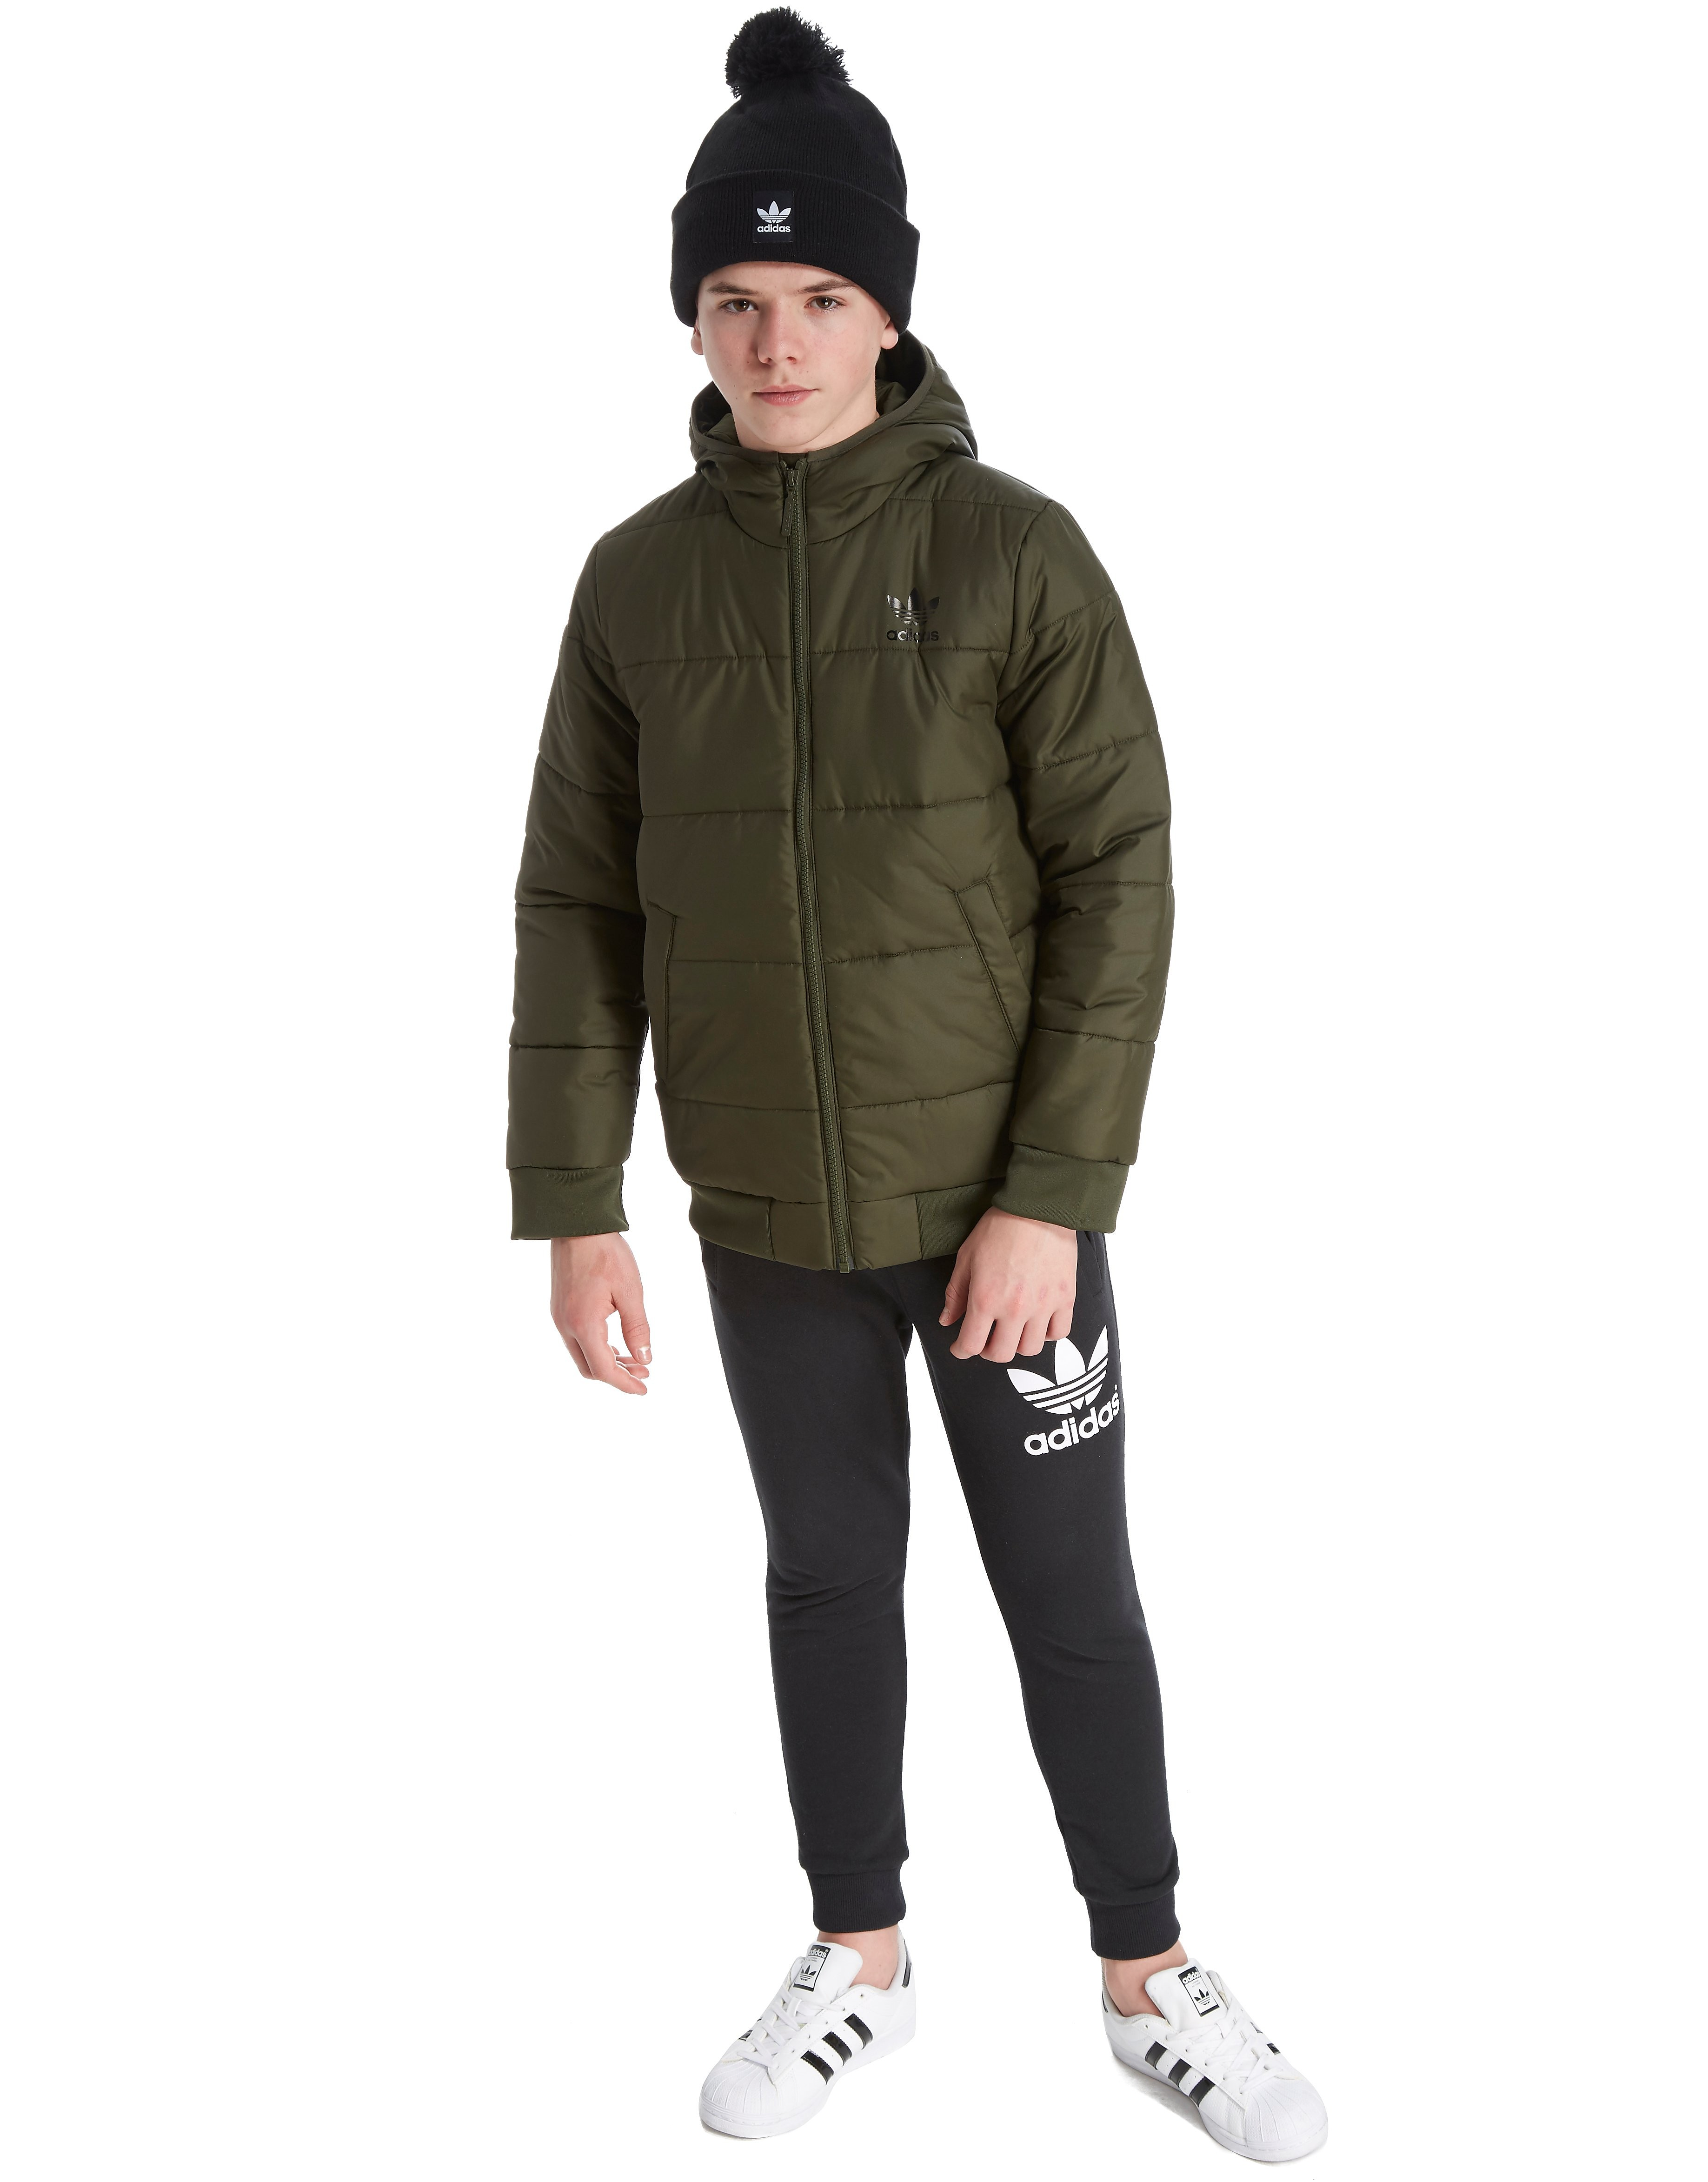 adidas Originals Parka Jacket Junior